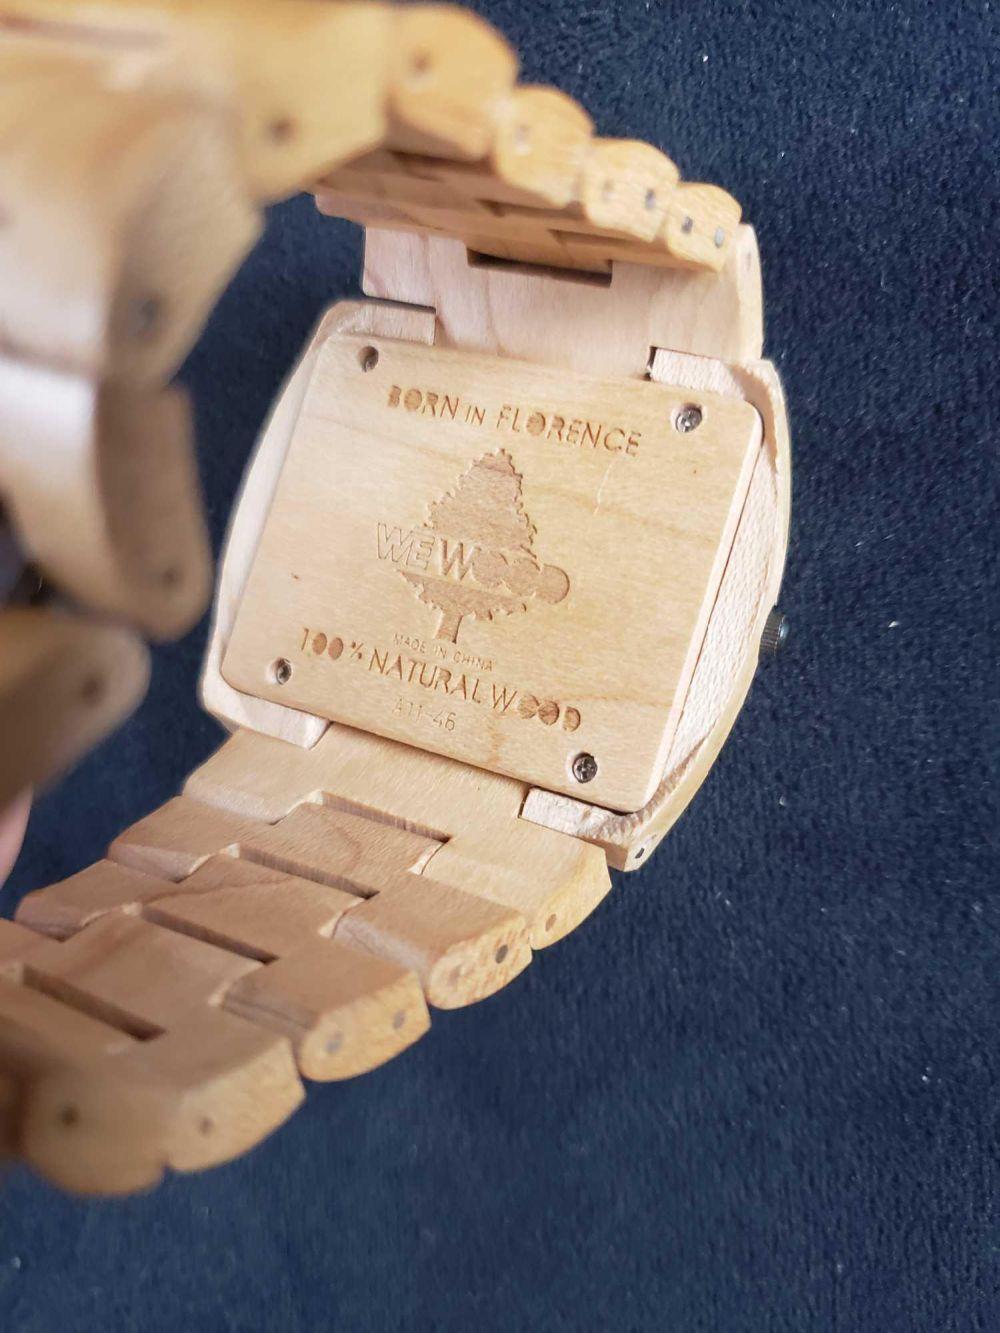 Lot 727: We Wood 100 Percent Natural Wood Watch